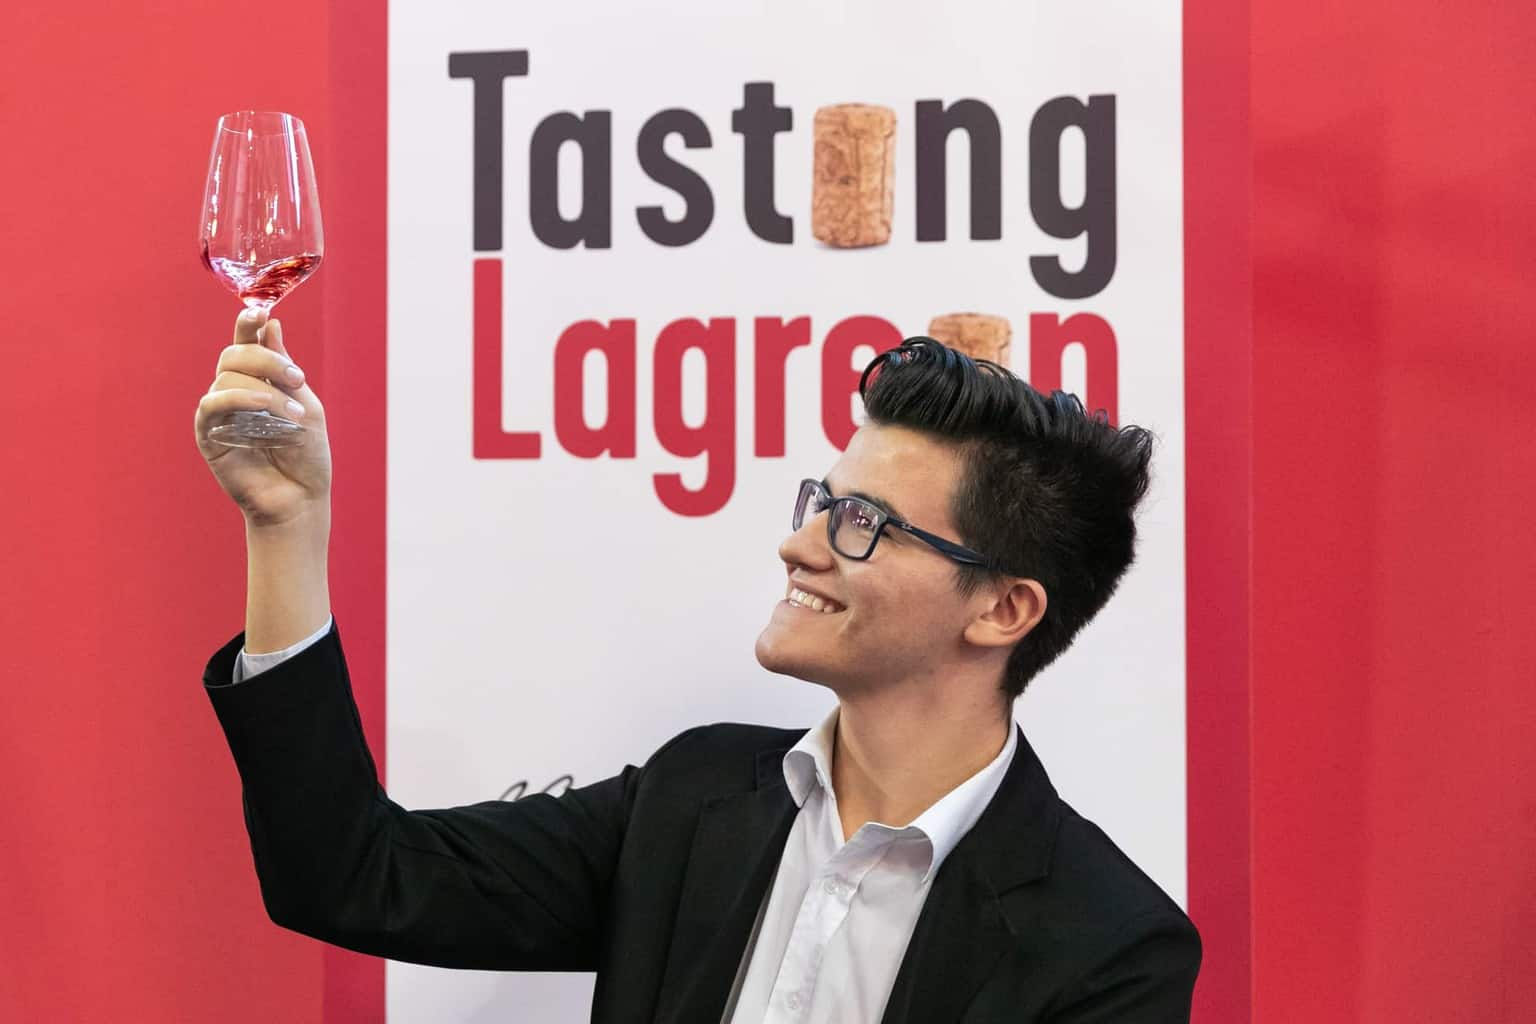 Wine Tasting Lagrein, Autochtona Bolzano